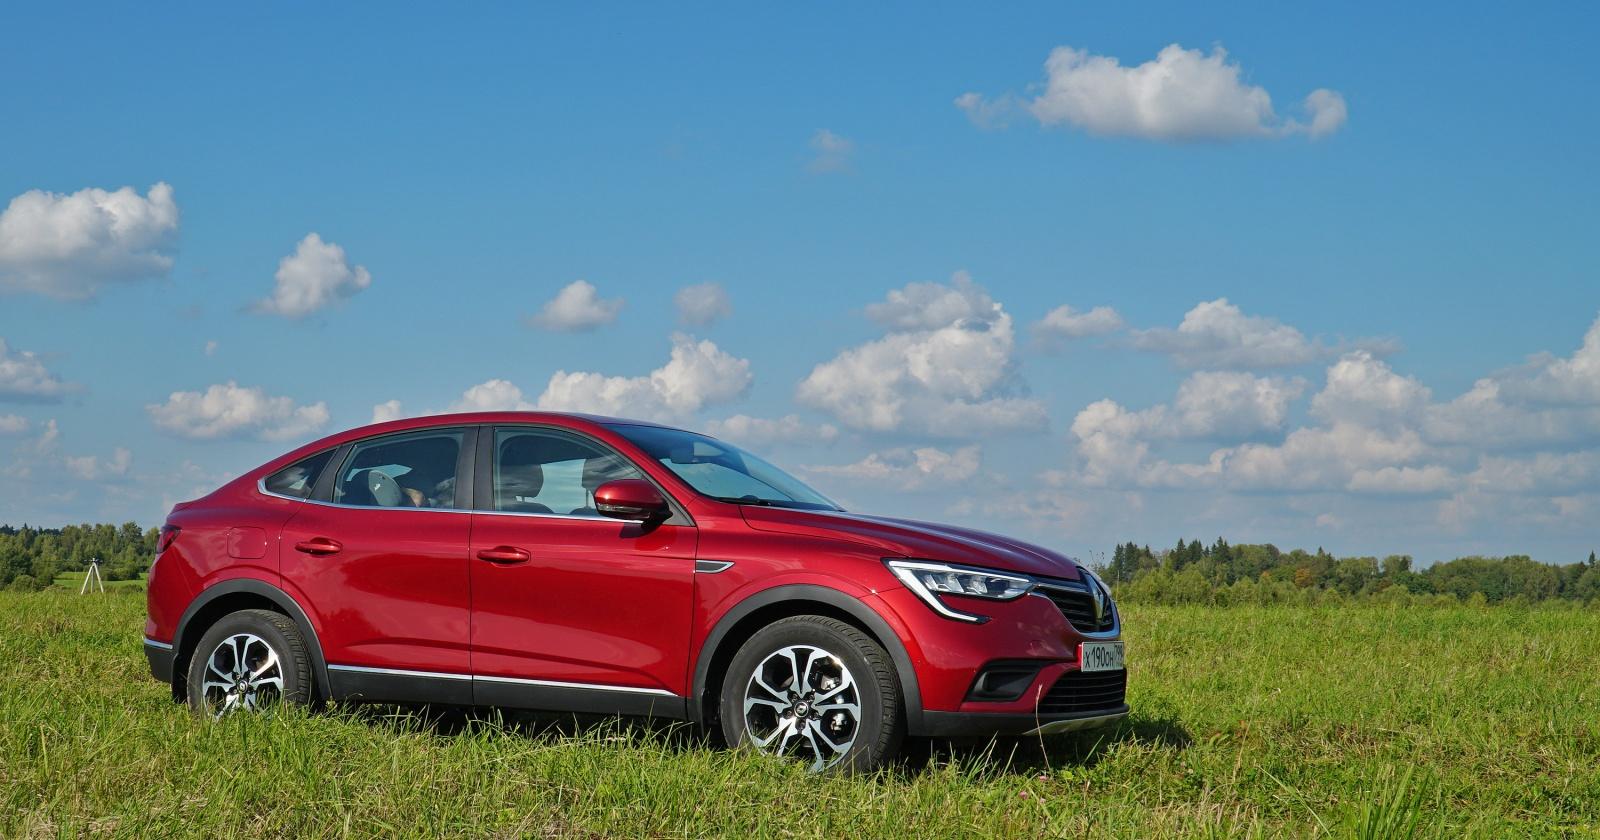 Кроссовер на миллион: тест Renault Arkana